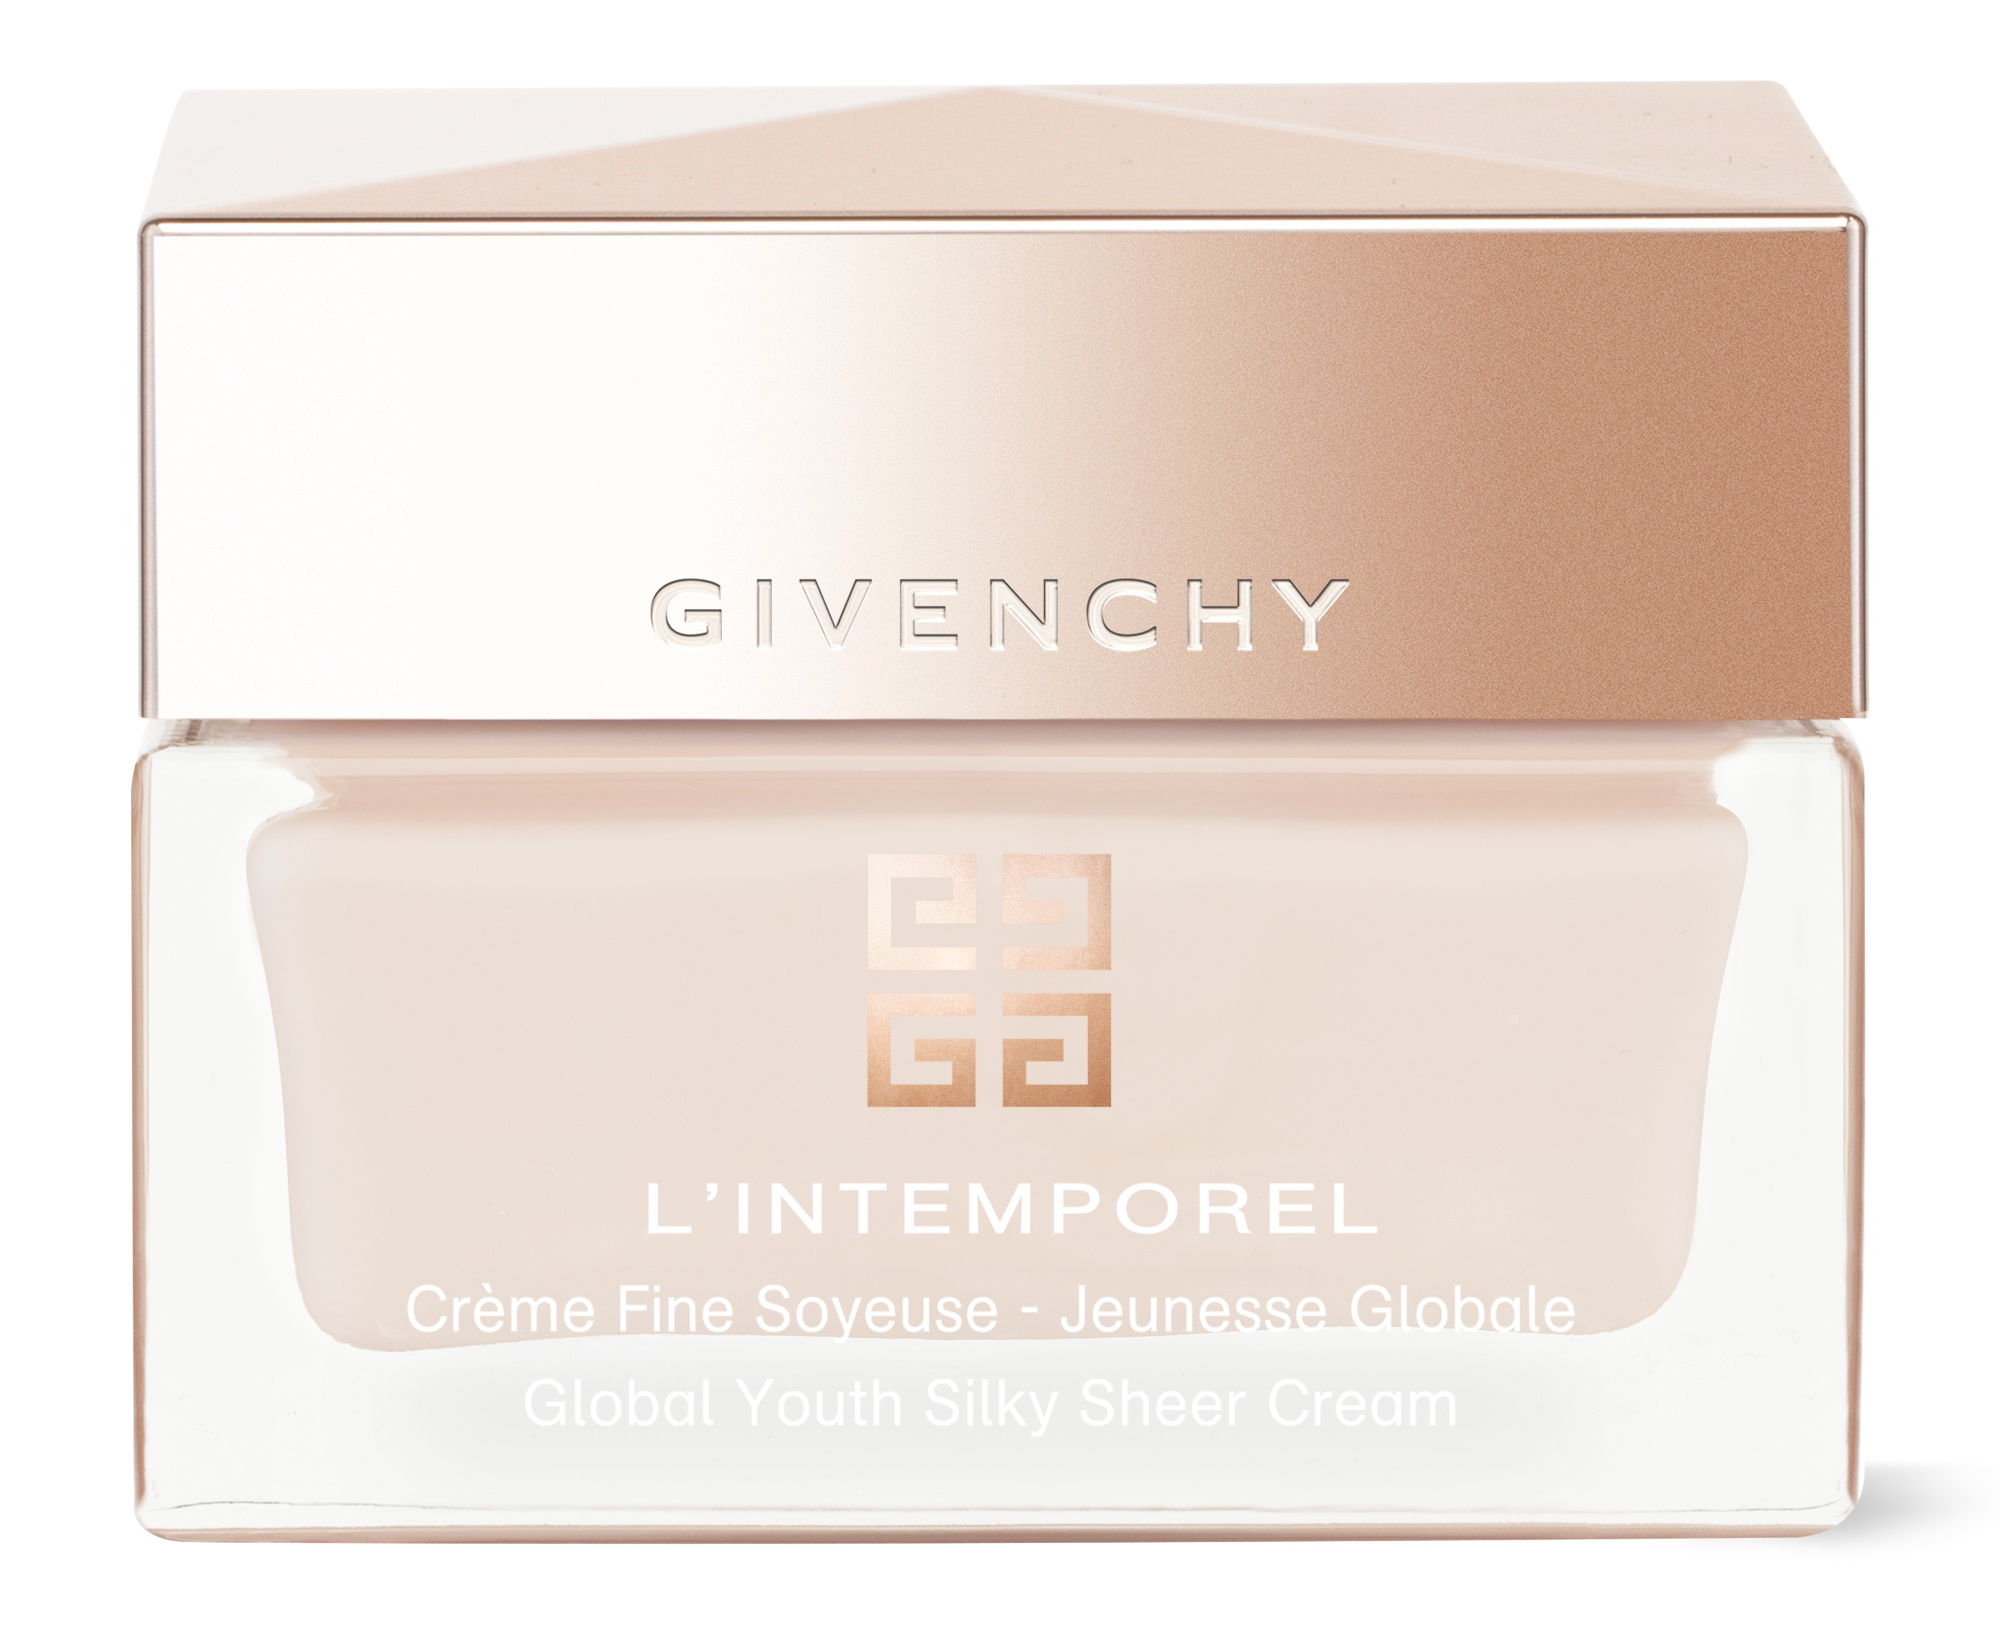 Givenchy L'Intemporel Global Youth Silky Sheer Cream